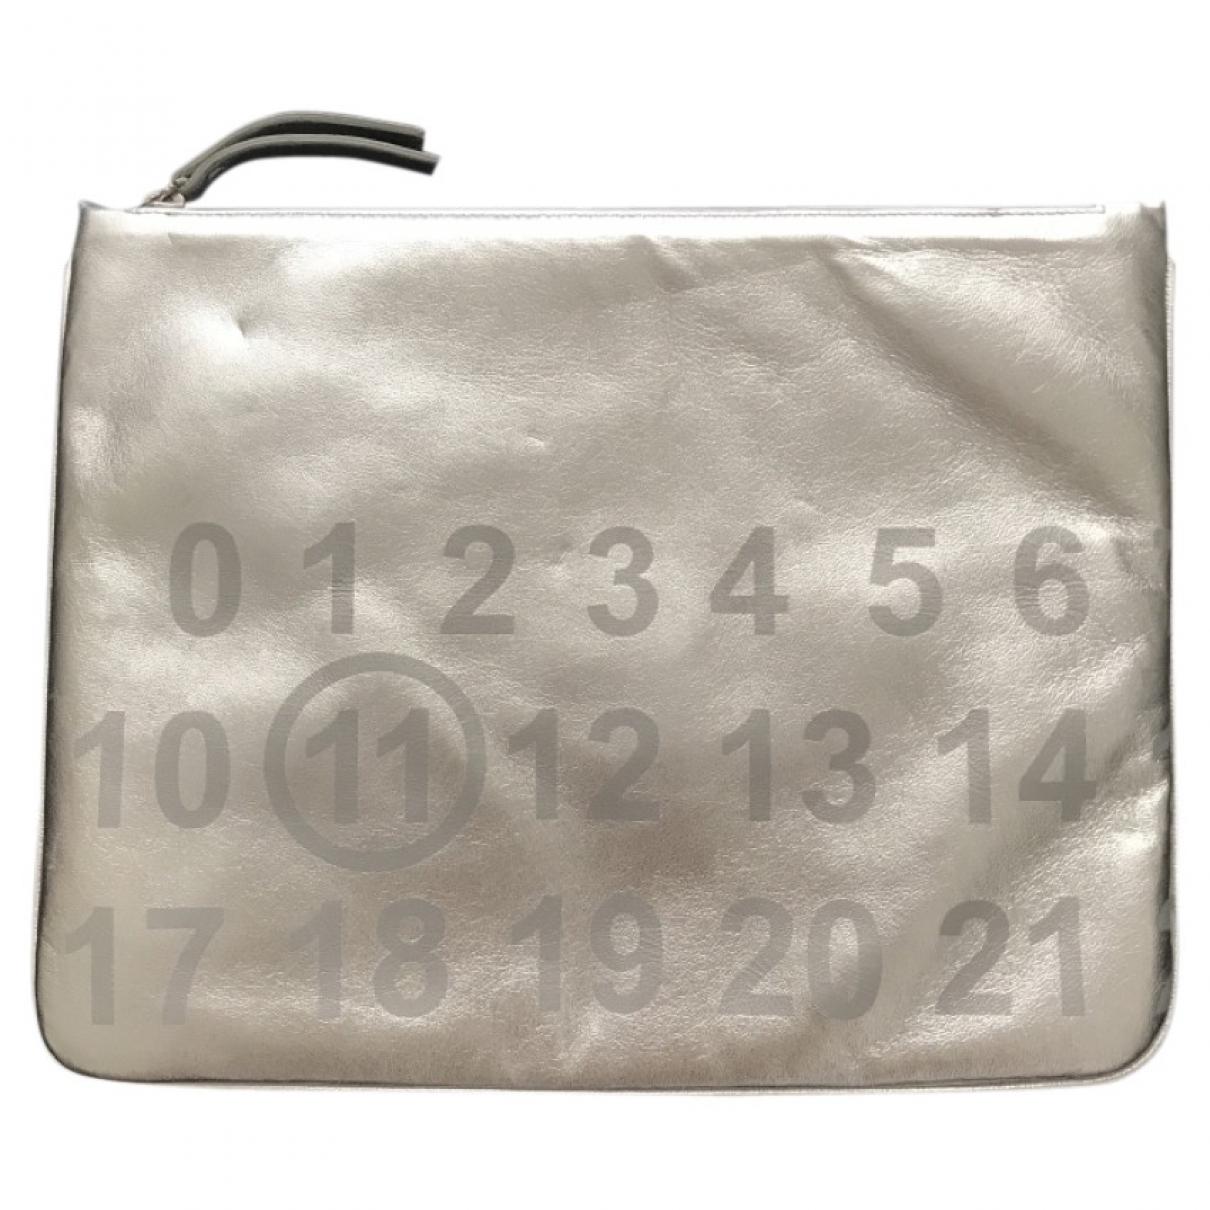 Maison Martin Margiela \N Silver Leather Clutch bag for Women \N